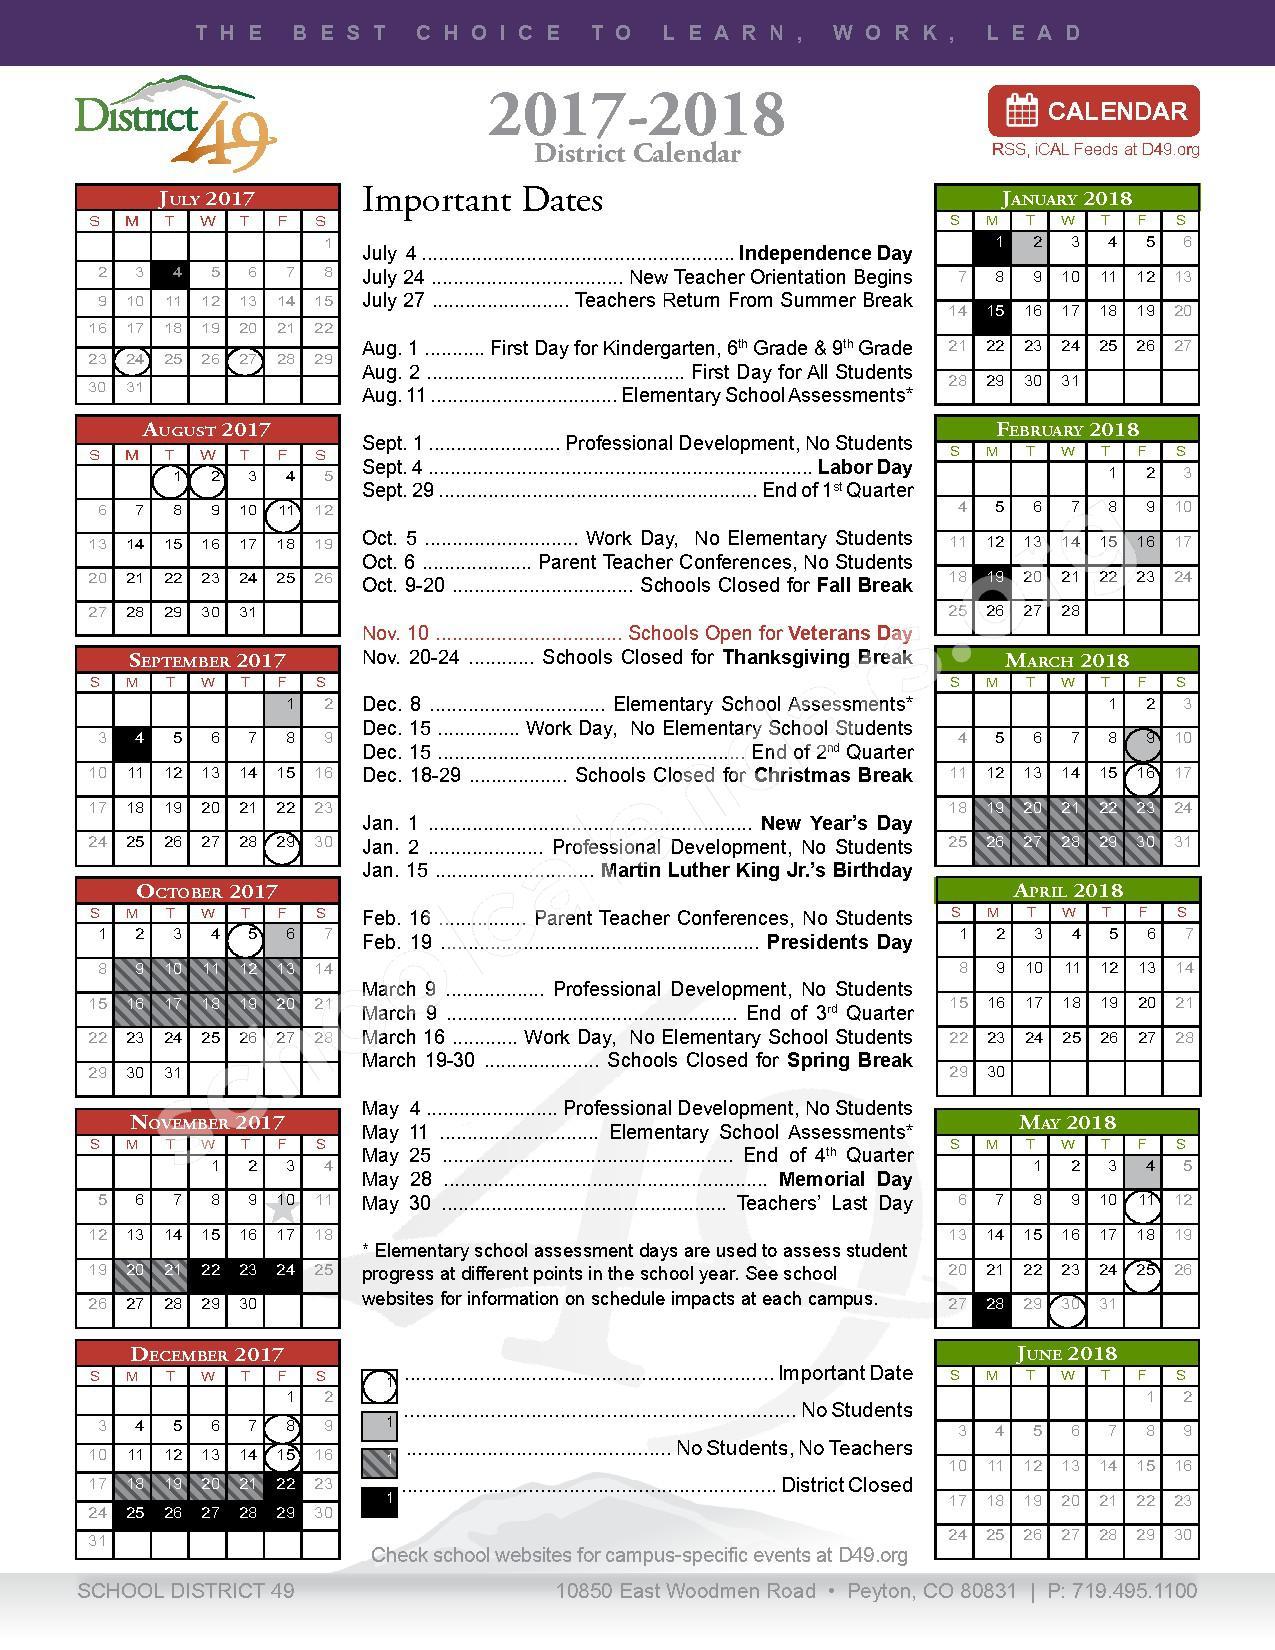 2017 - 2018 District Calendar – Falcon School District 49 – page 1